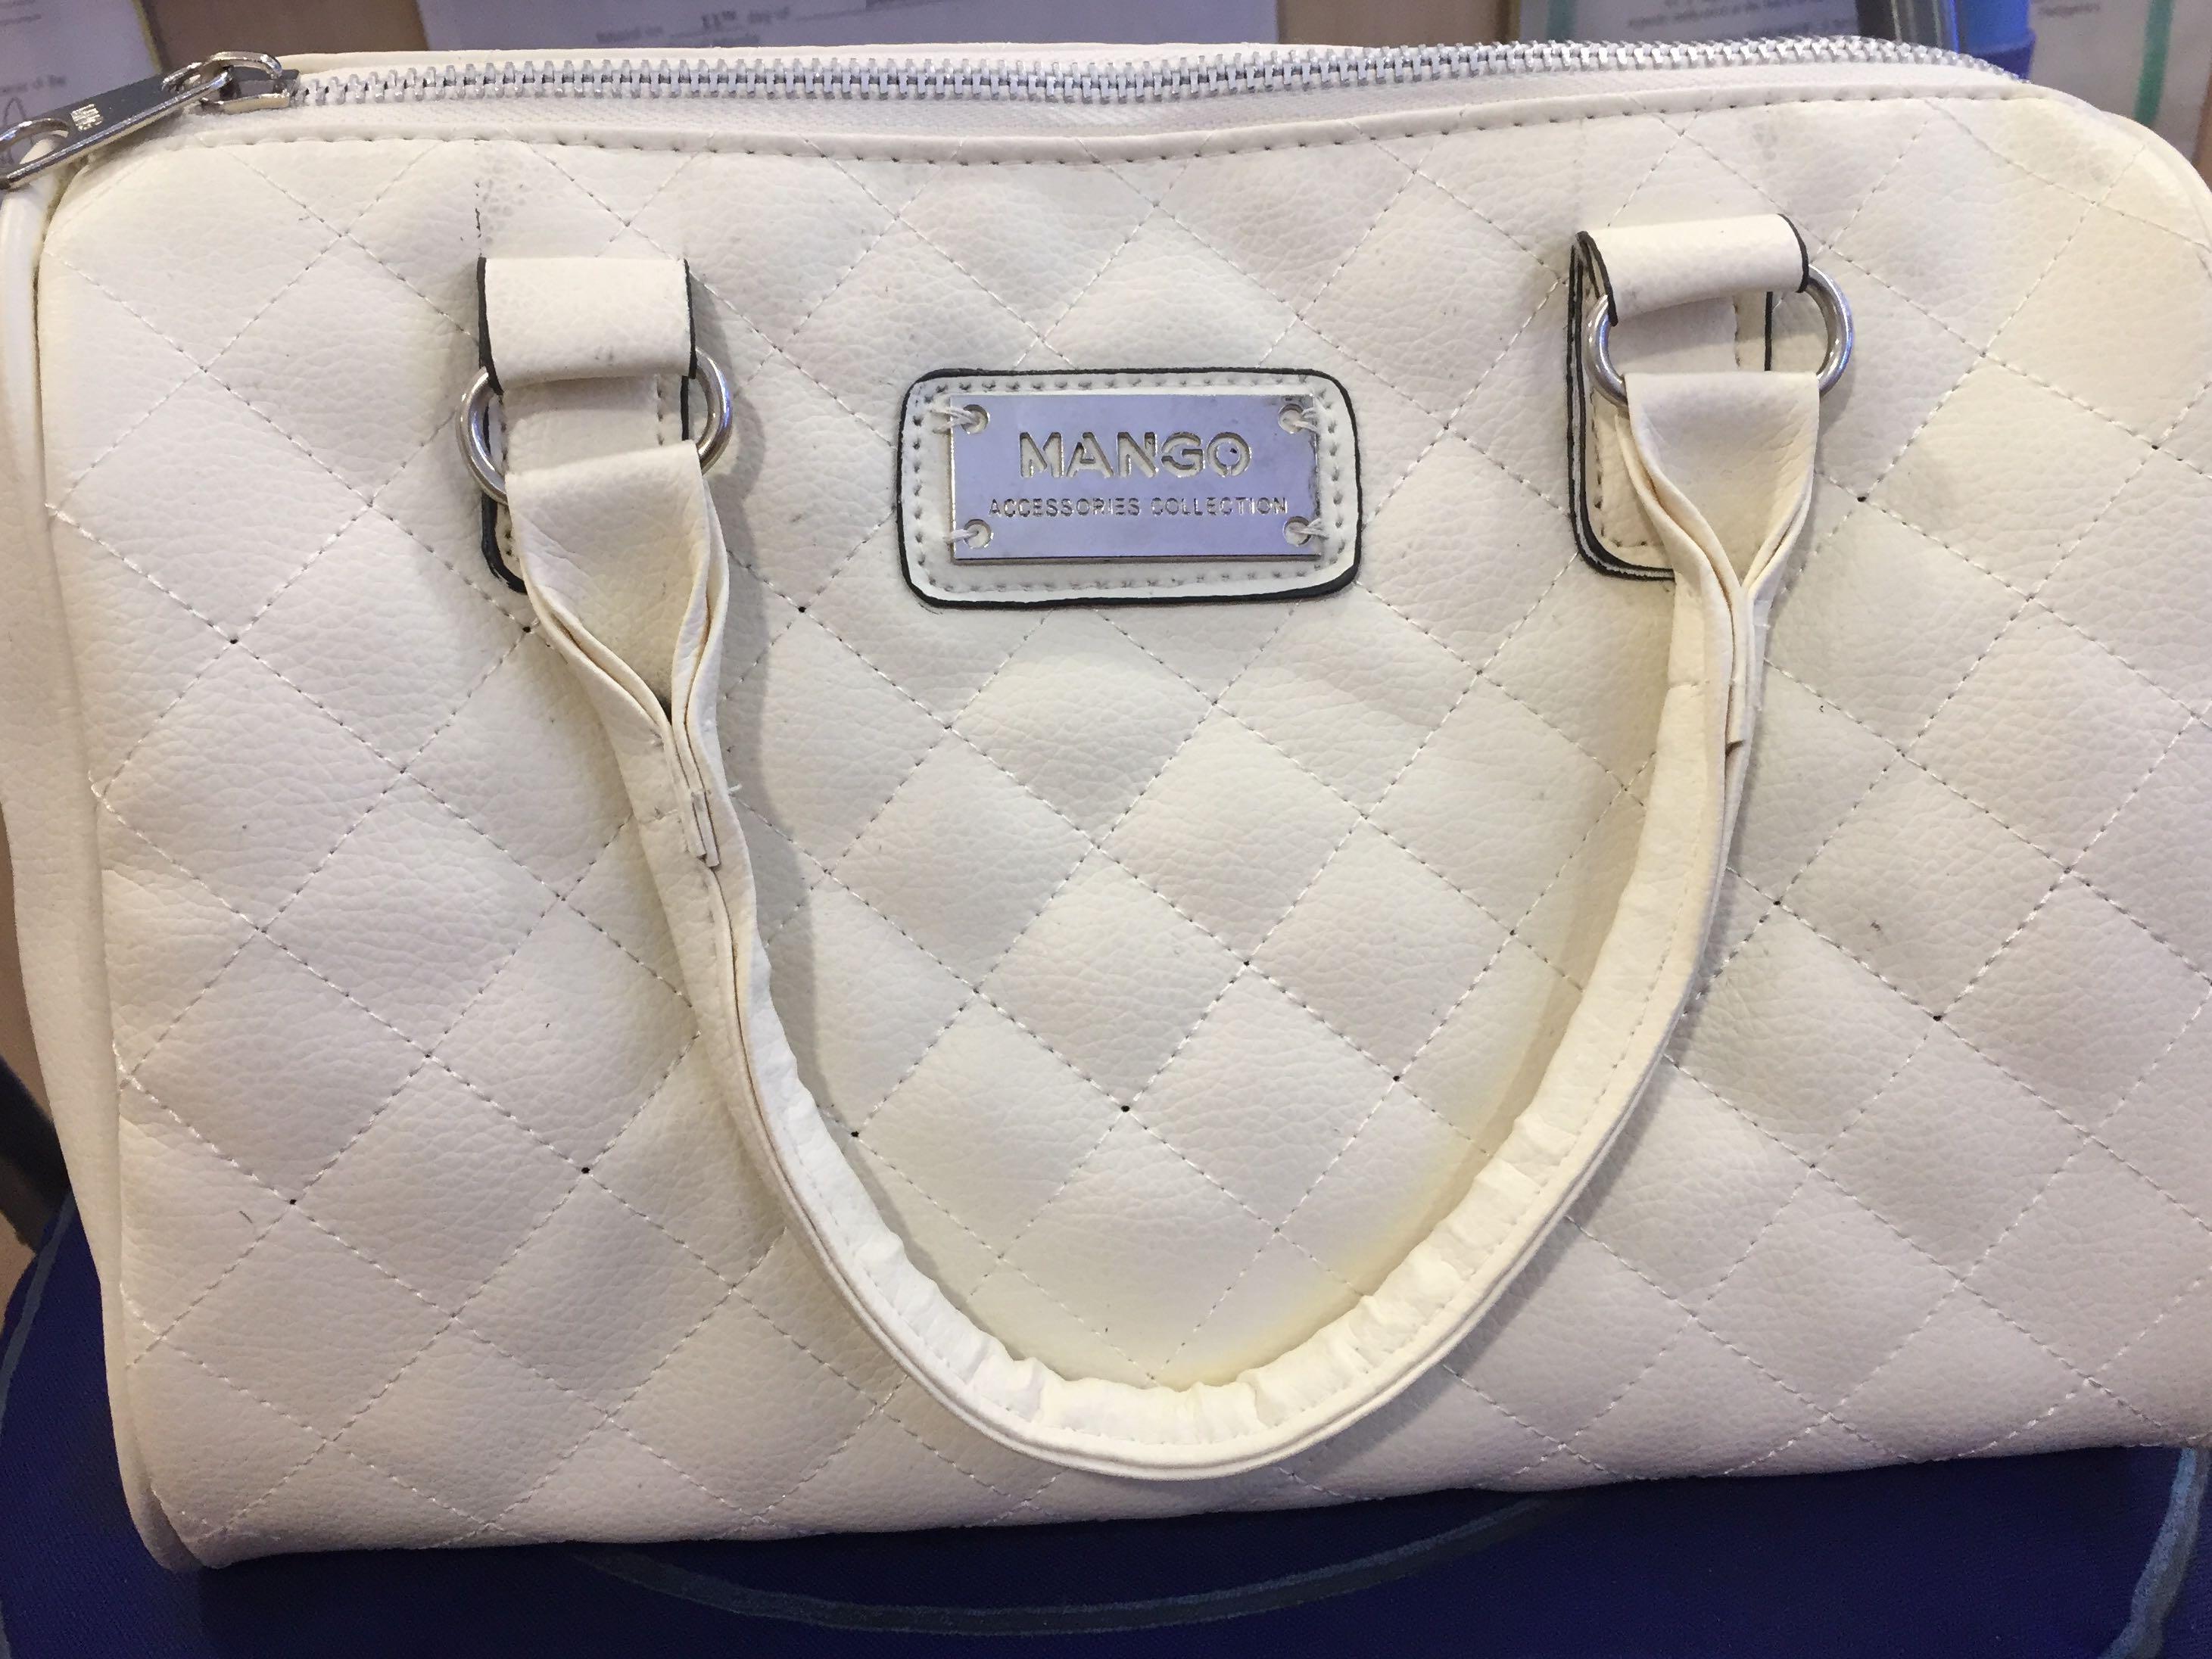 da5b7e65b4 Home · Women s Fashion · Bags   Wallets. photo photo photo photo photo